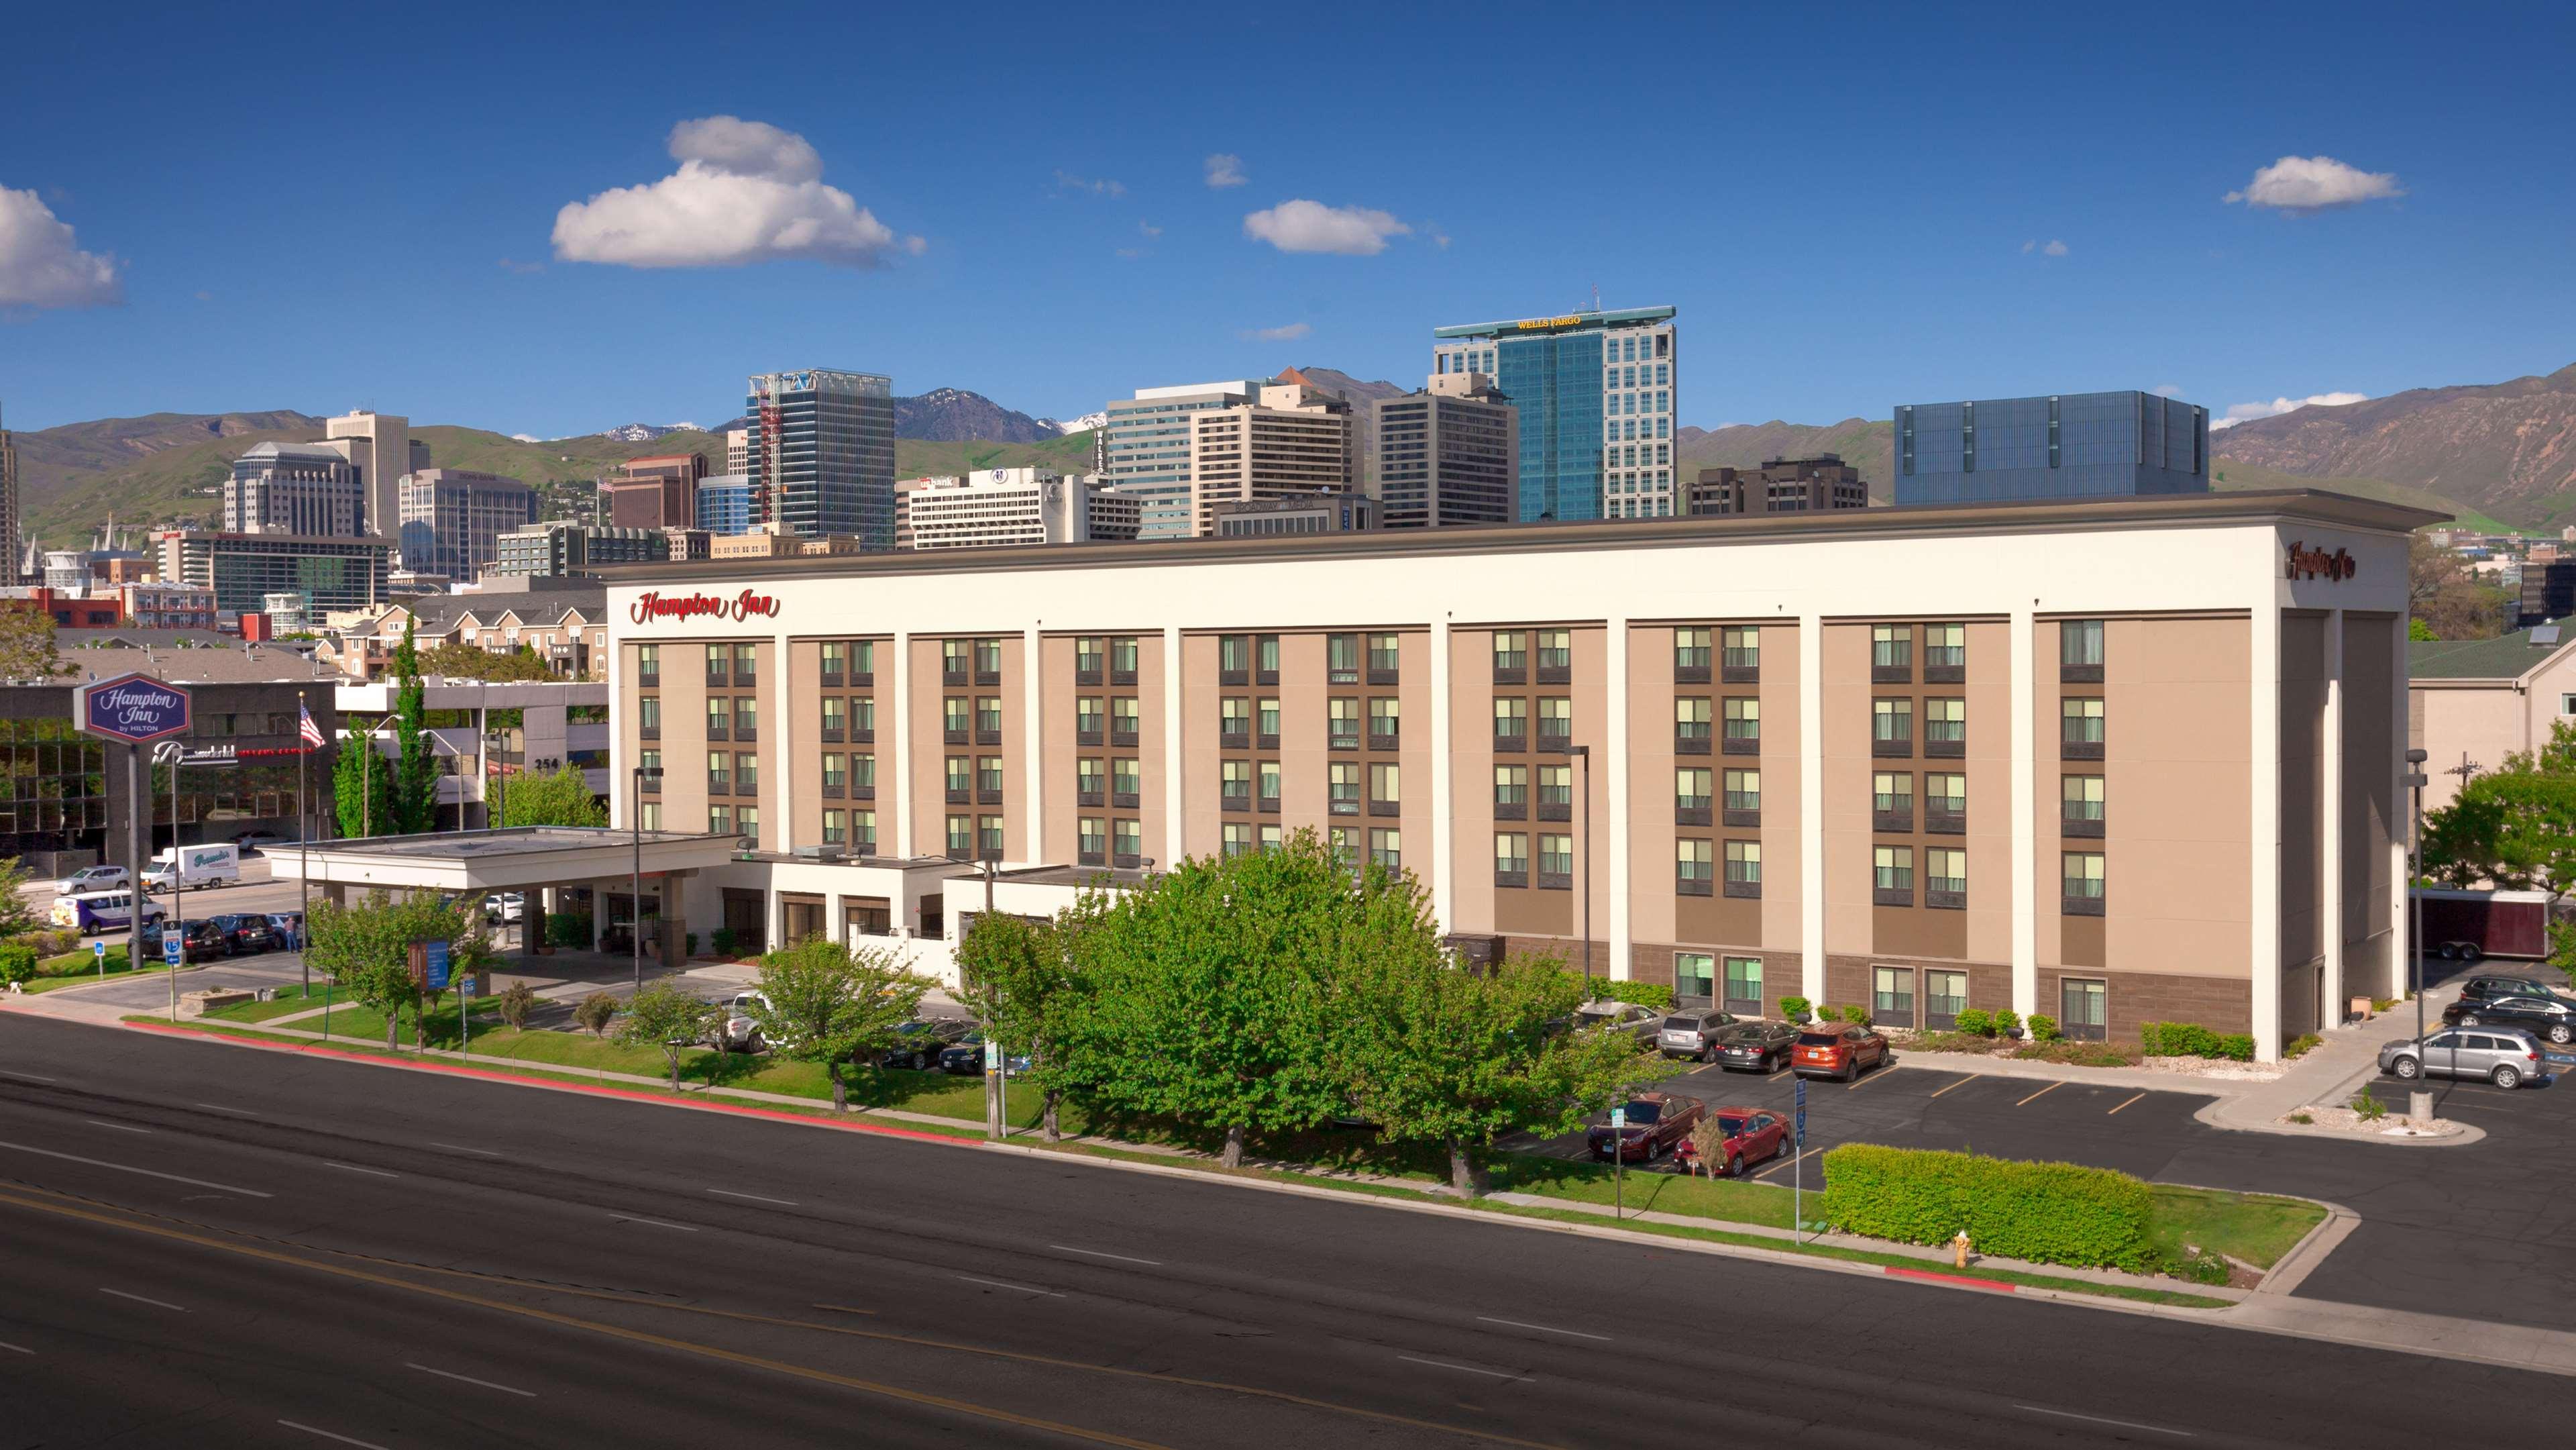 Hotels Near Salt Palace Convention Center